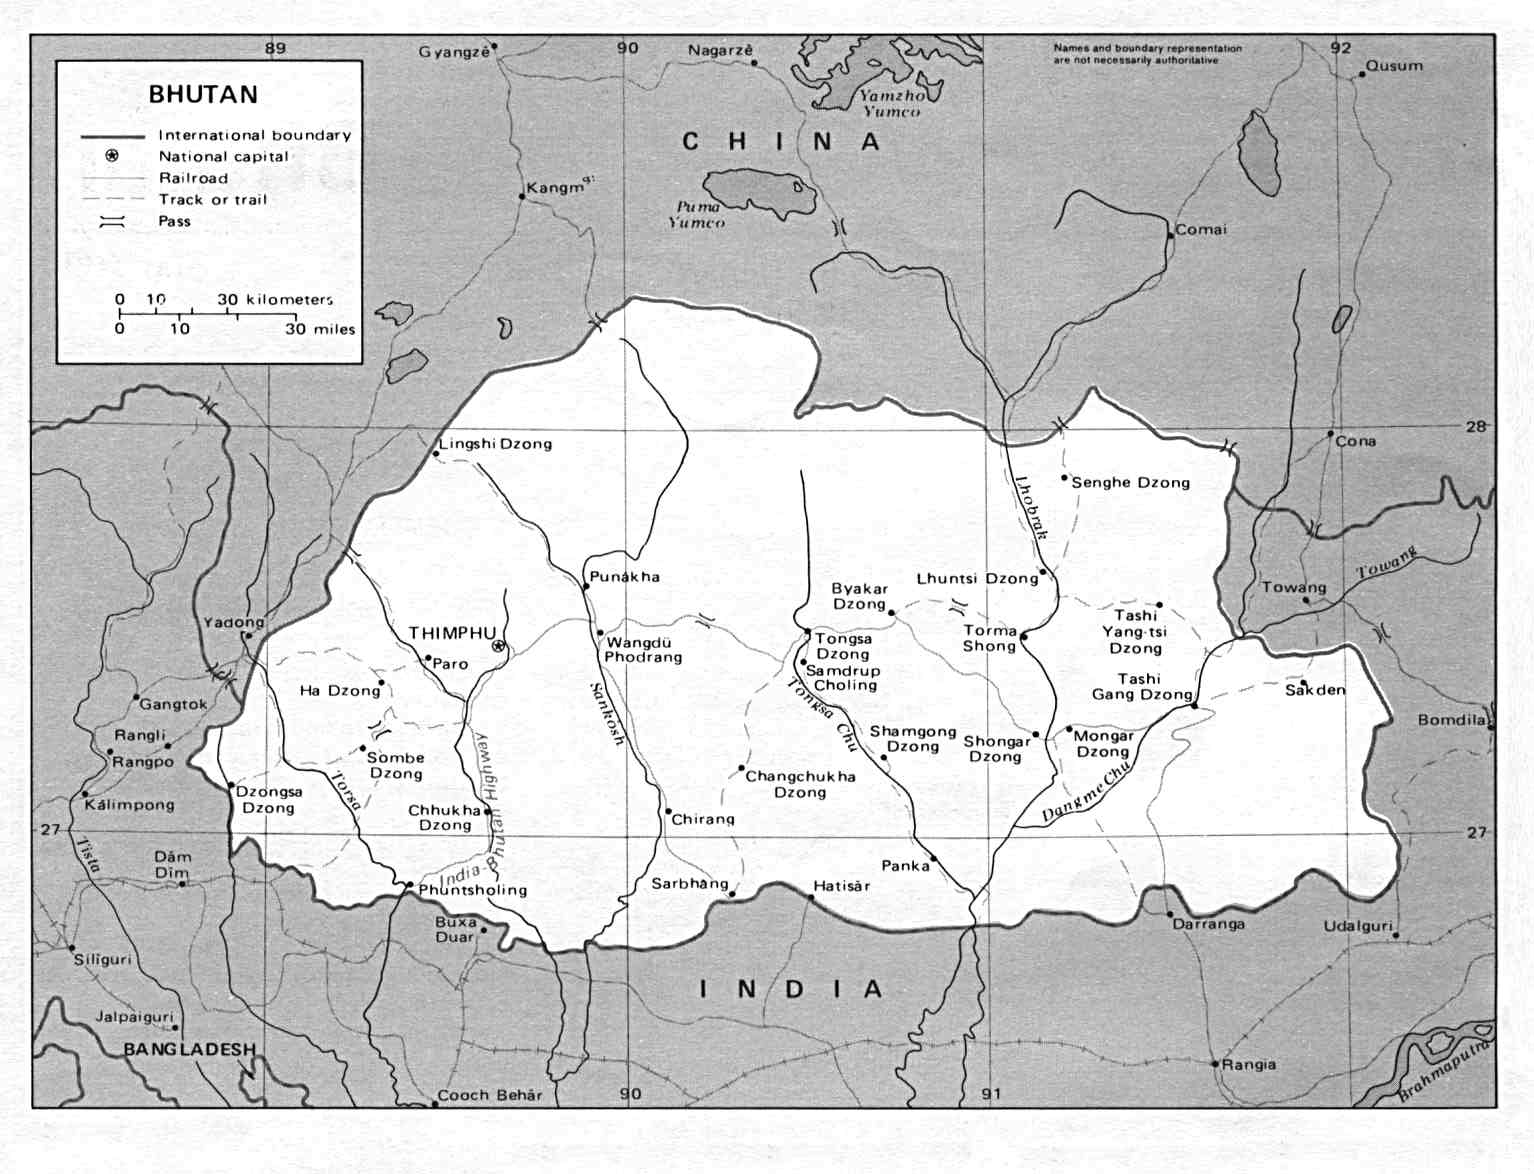 Bhutan Maps PerryCastañeda Map Collection UT Library Online - Bhutan map